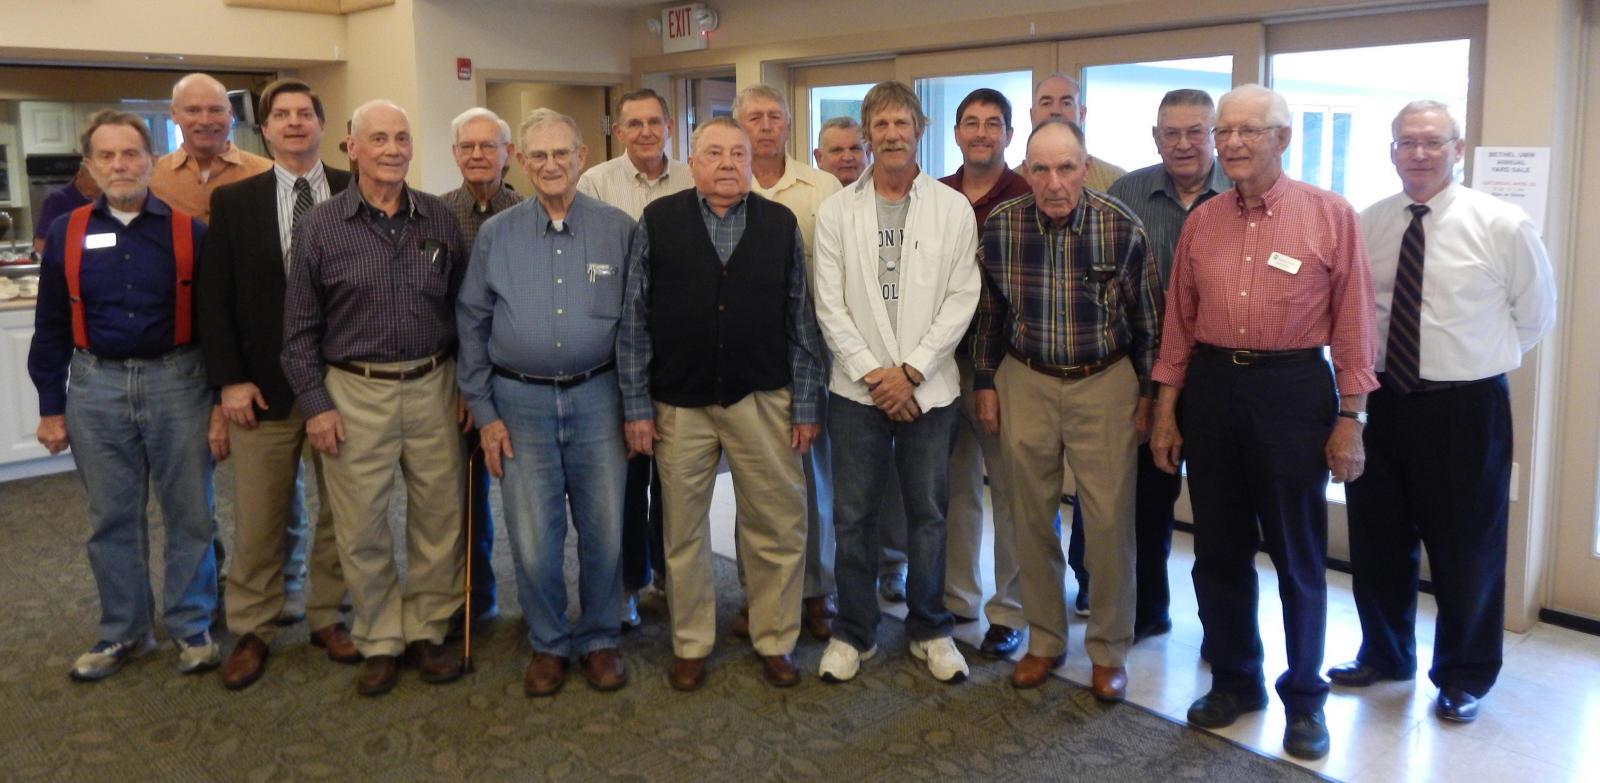 Meet the Warrenton Ruritan Club